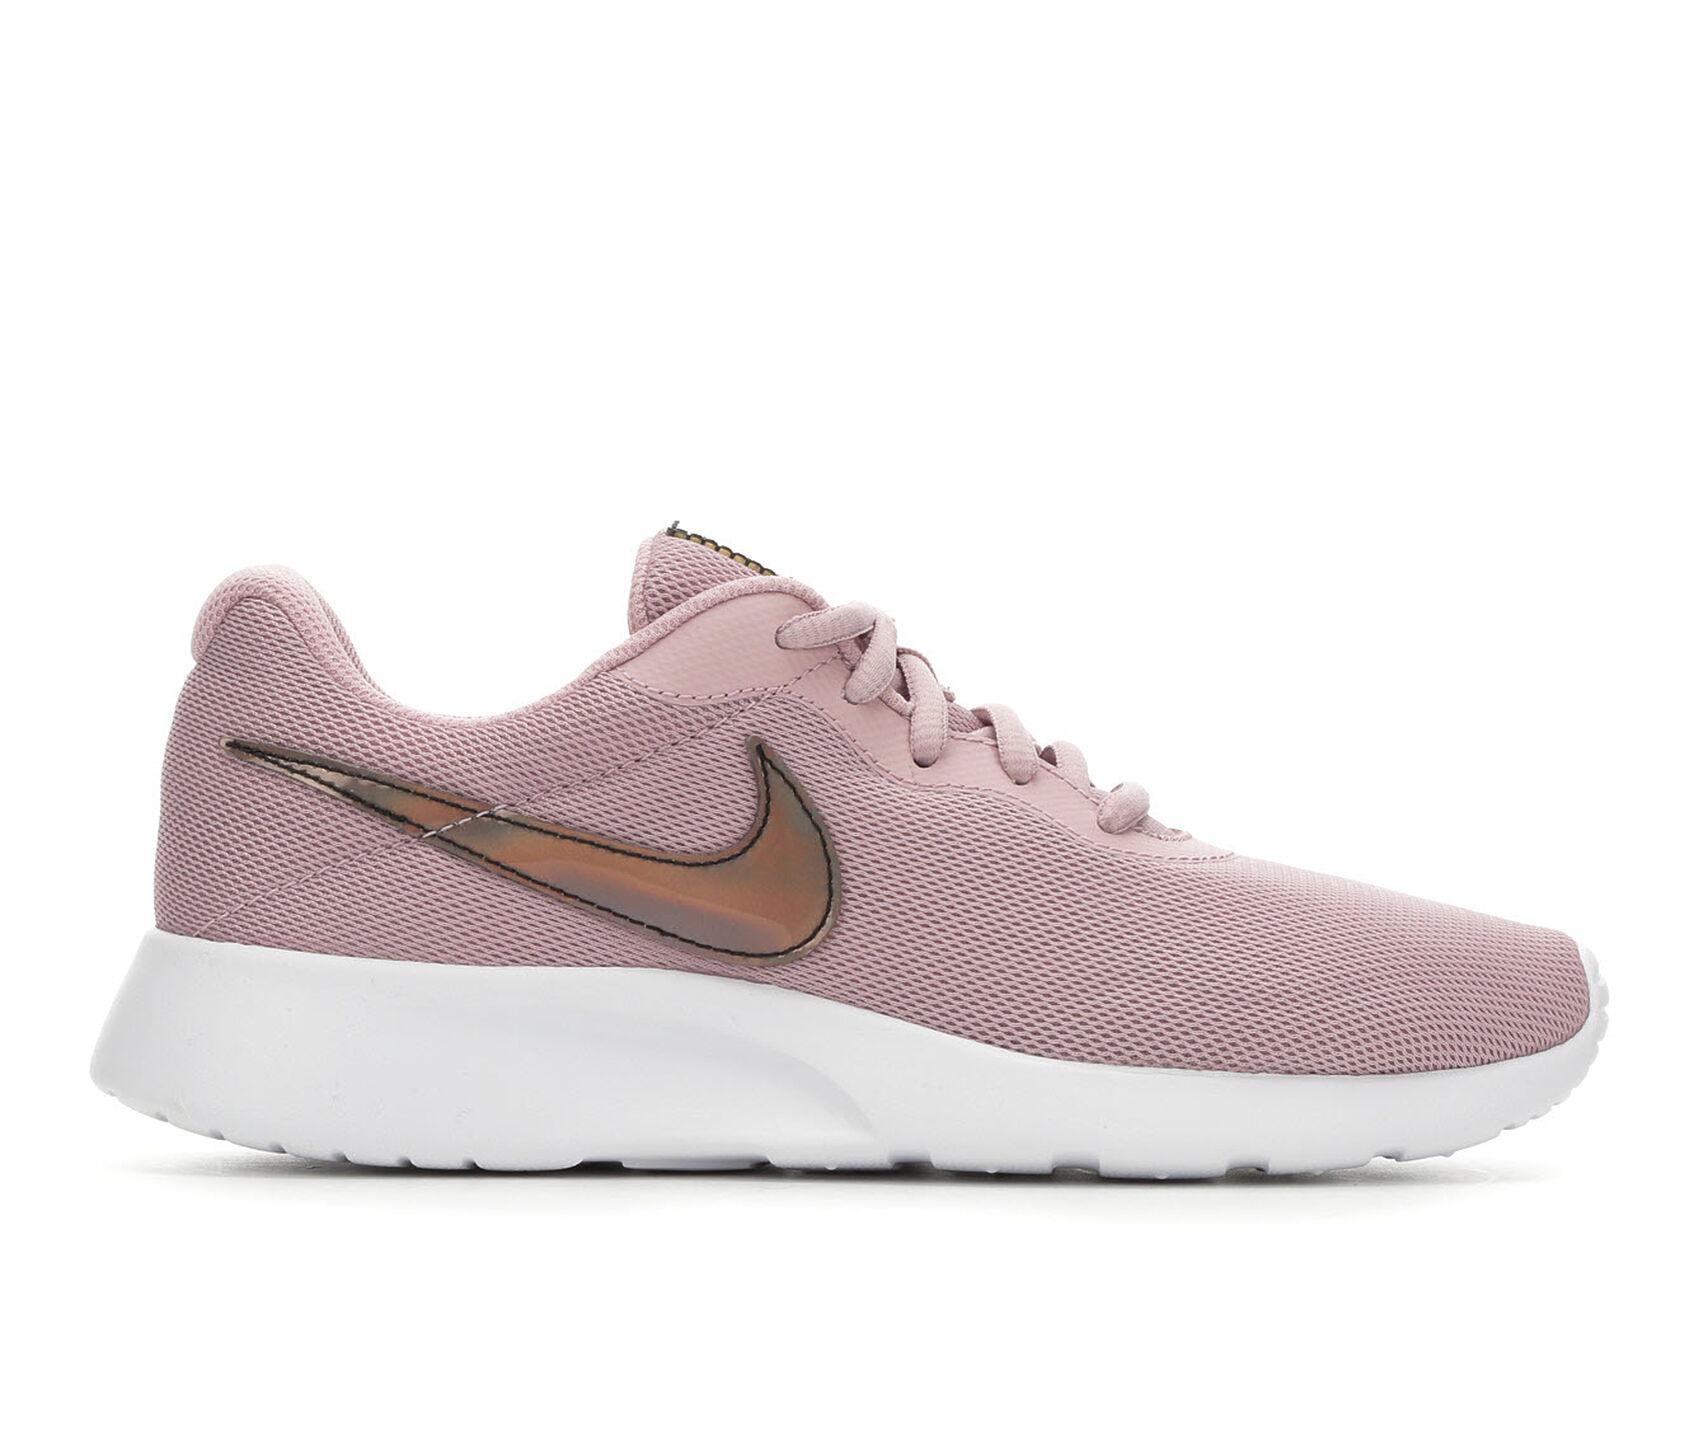 0800dc6d4a0 Women s Nike Tanjun Sneakers